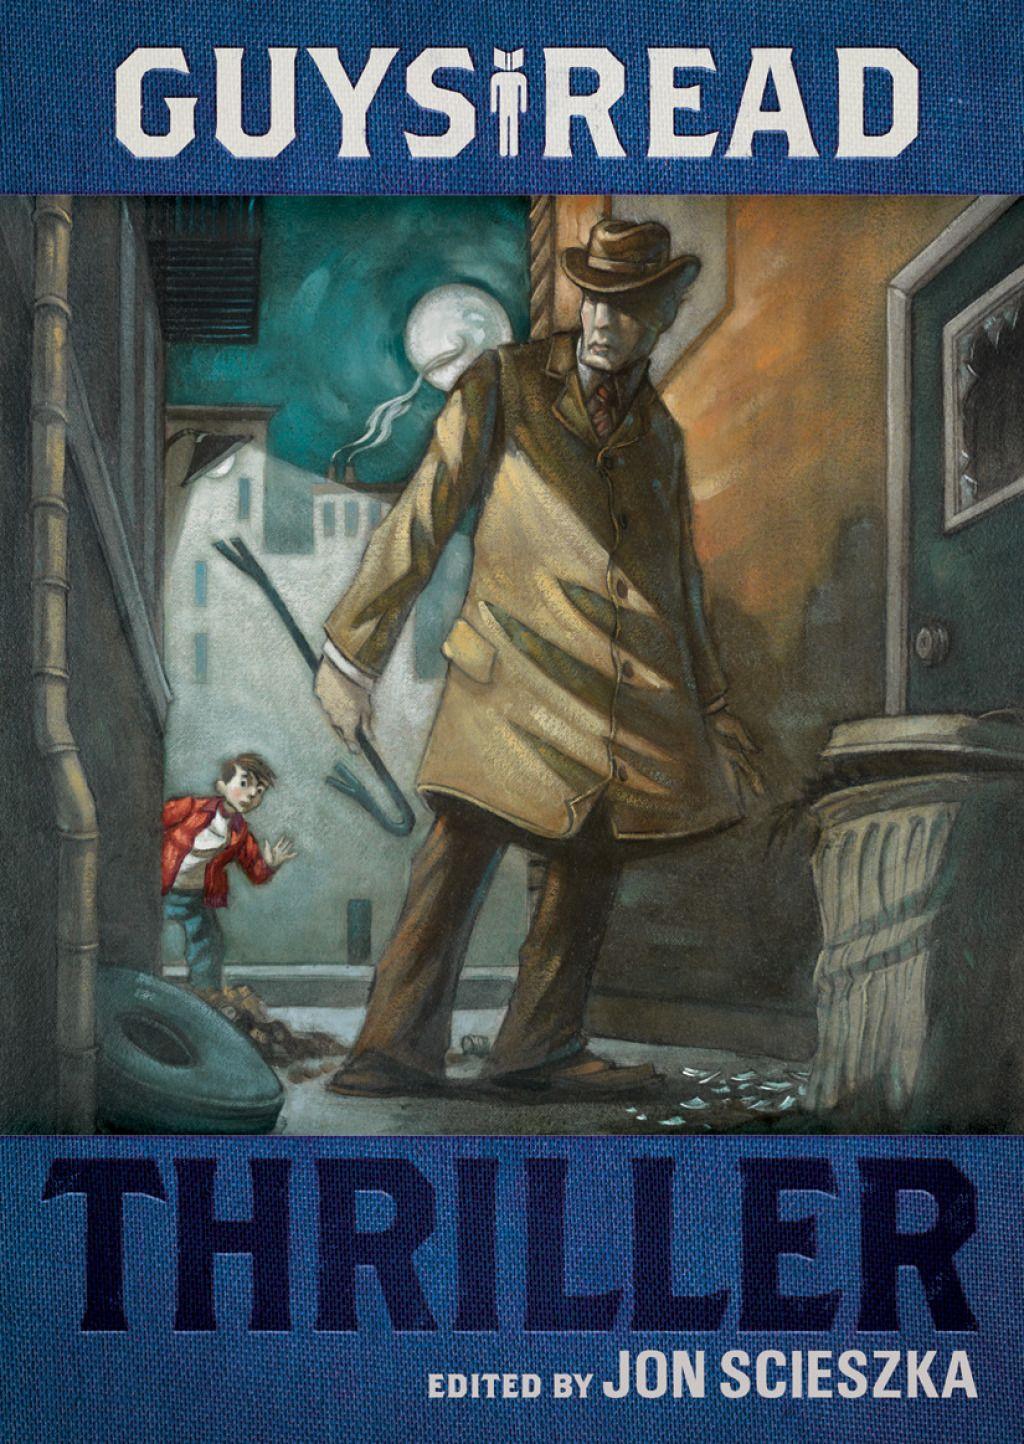 Guys read thriller ebook guys read